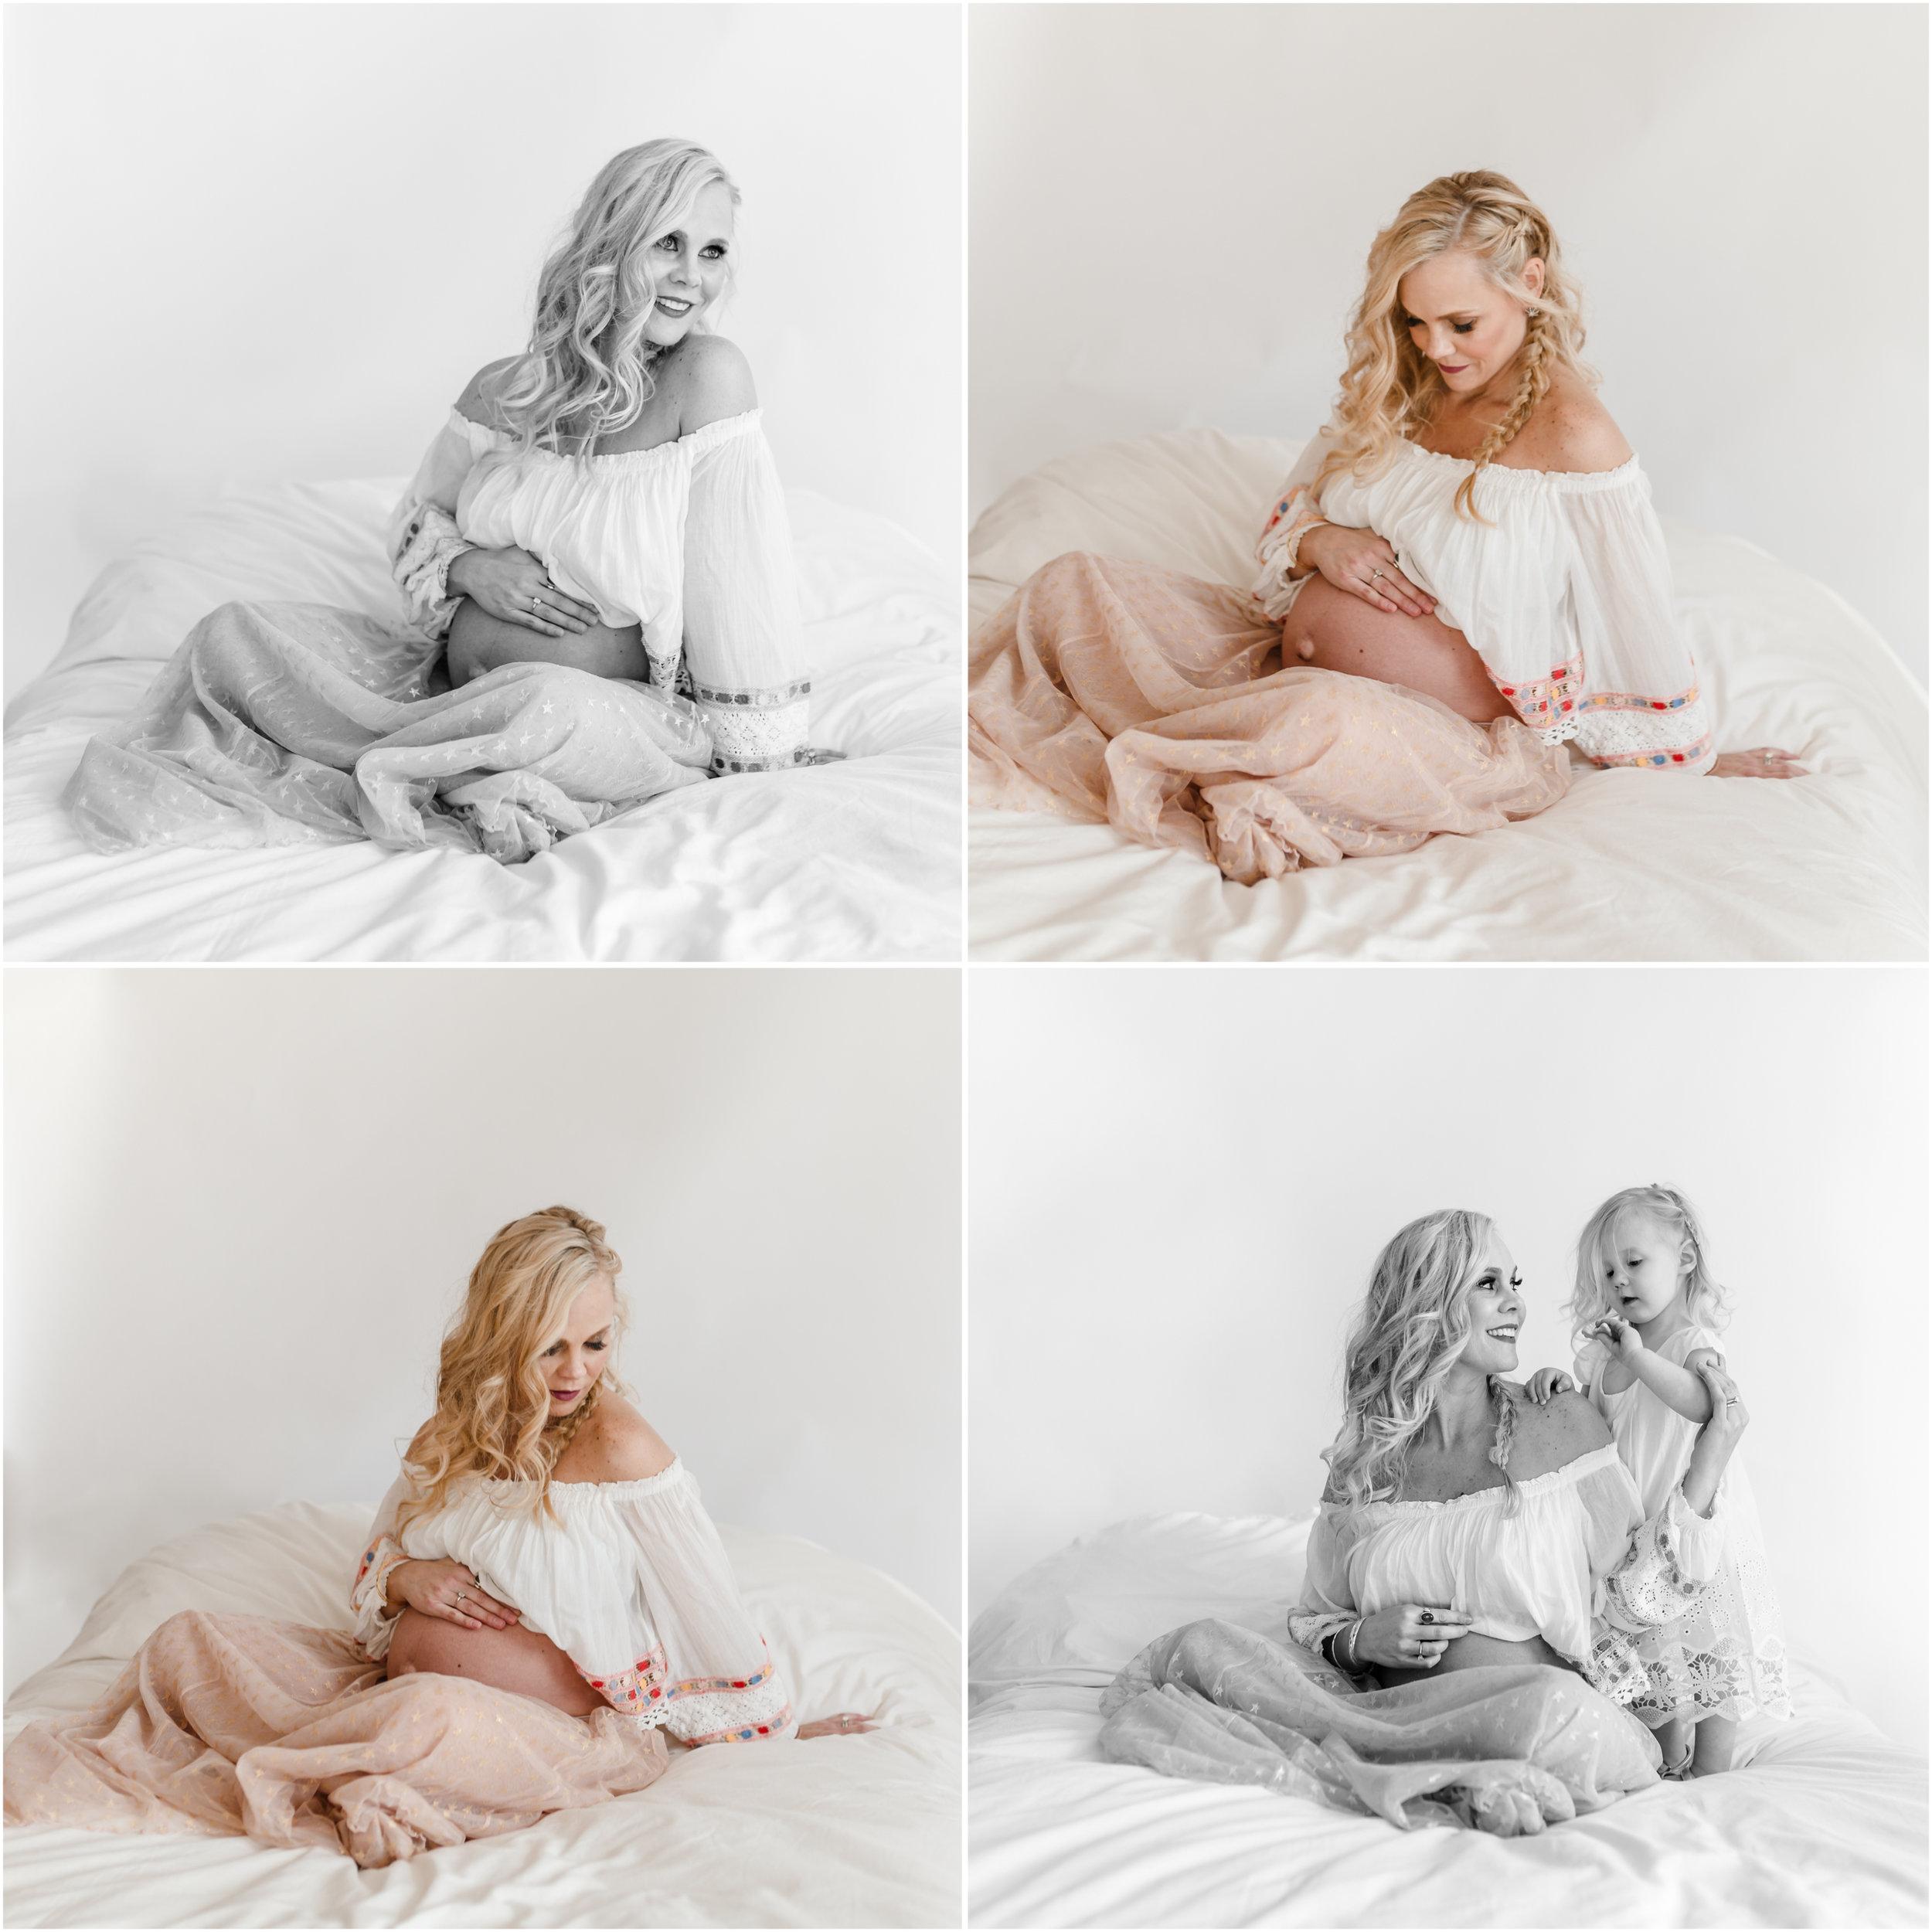 chicago maternity lifestyle photographer jenny grimm boho chic pregnancy session